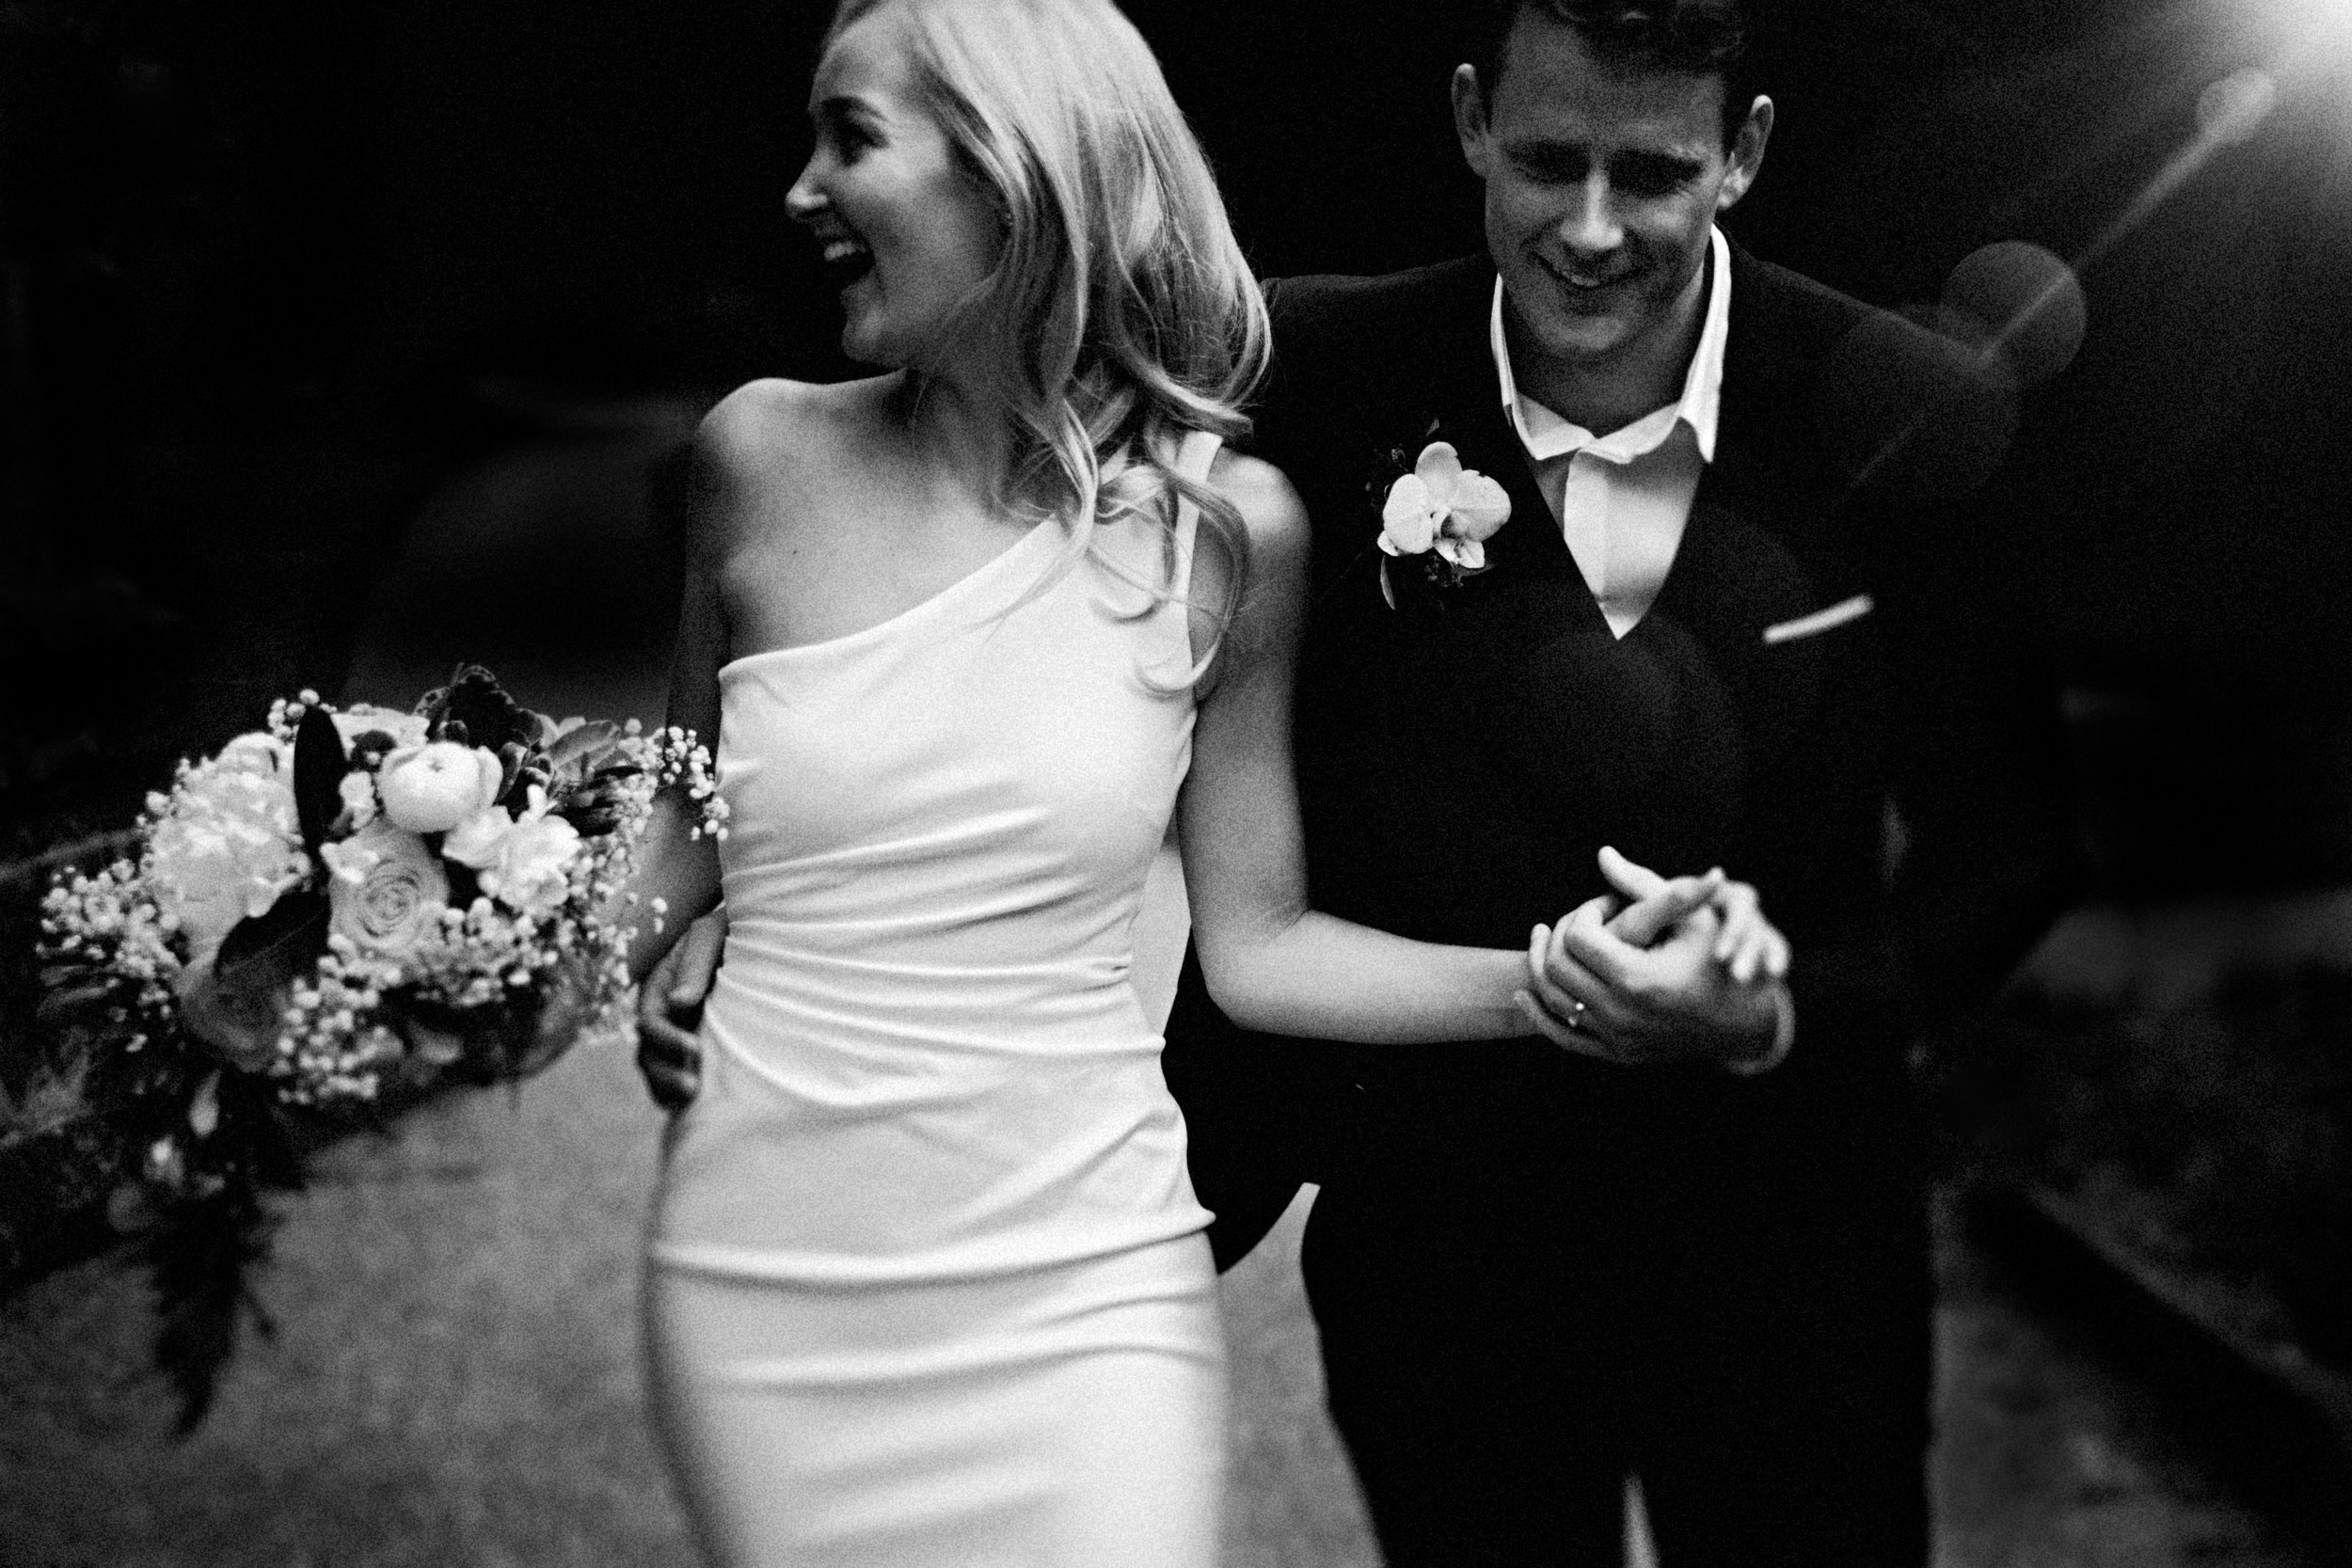 prestbury-cheshire-wedding-photographer-0030.JPG